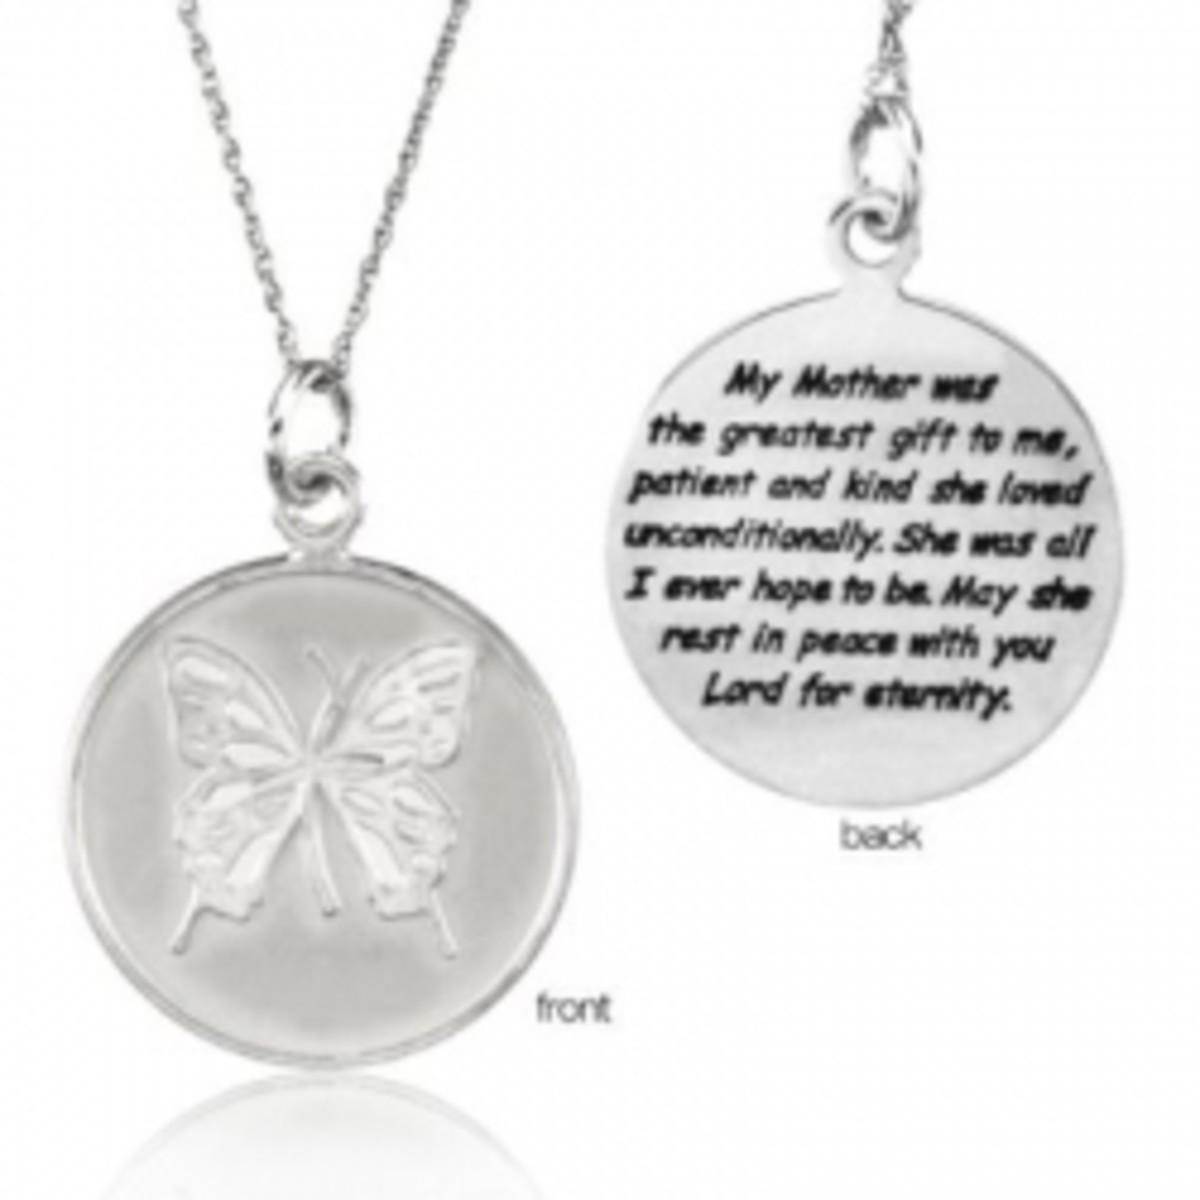 Mother's Memorial Necklace